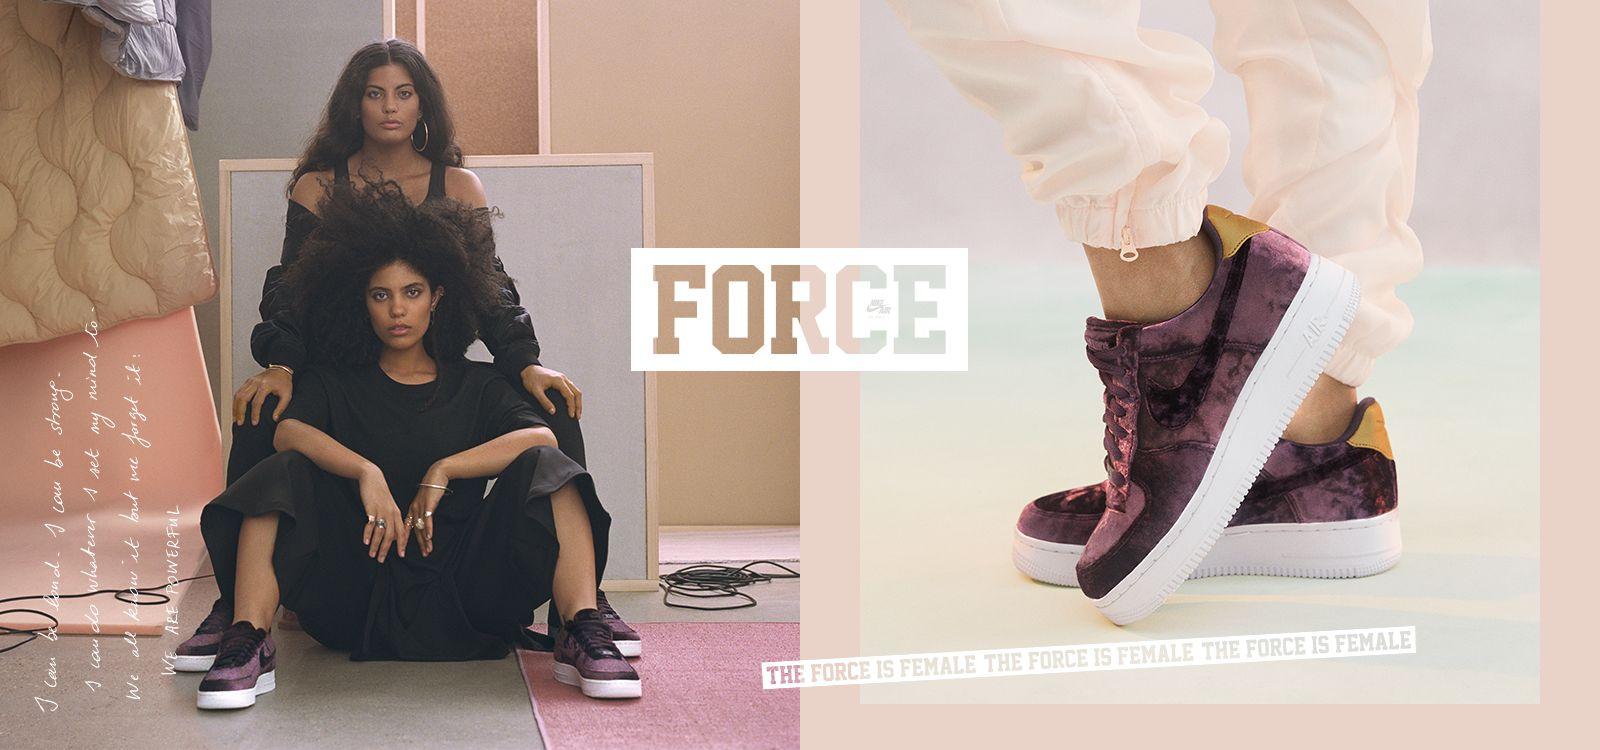 Is FemaleQuand Célèbre Force The La Femme Nike WEDH2e9YIb